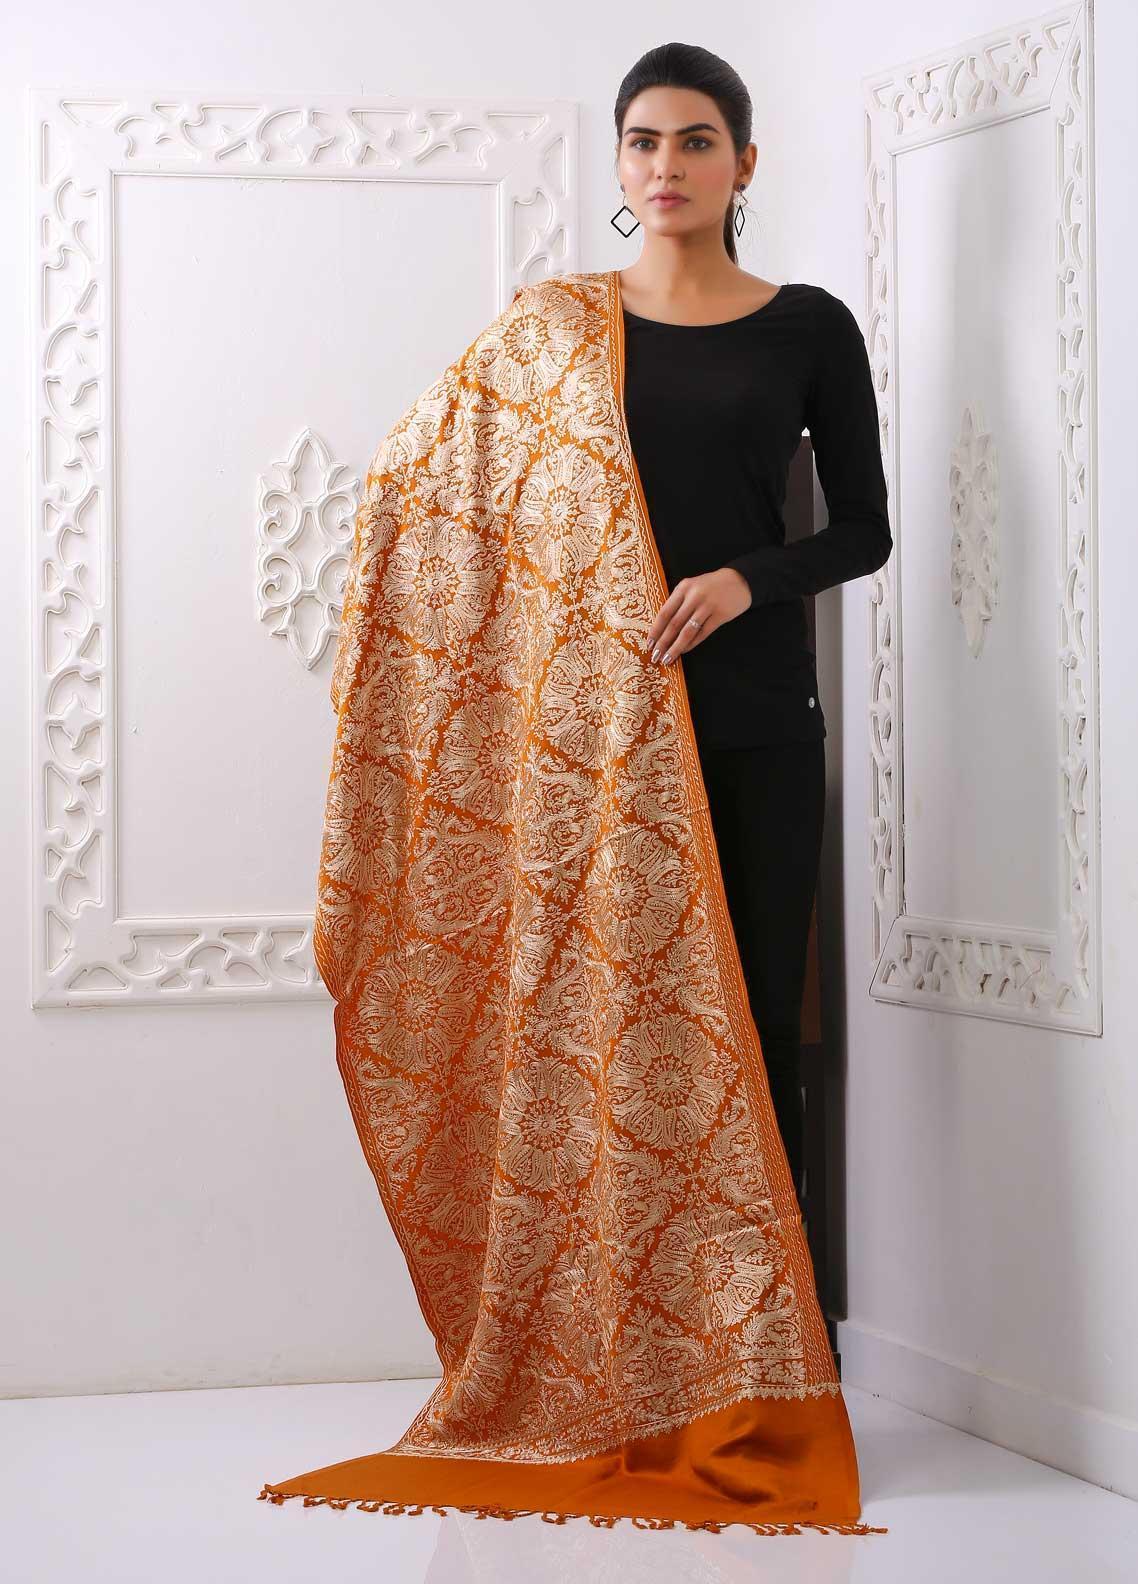 Sanaulla Exclusive Range Embroidered Pashmina  Stole PSTL 323857  Pashmina Stoles